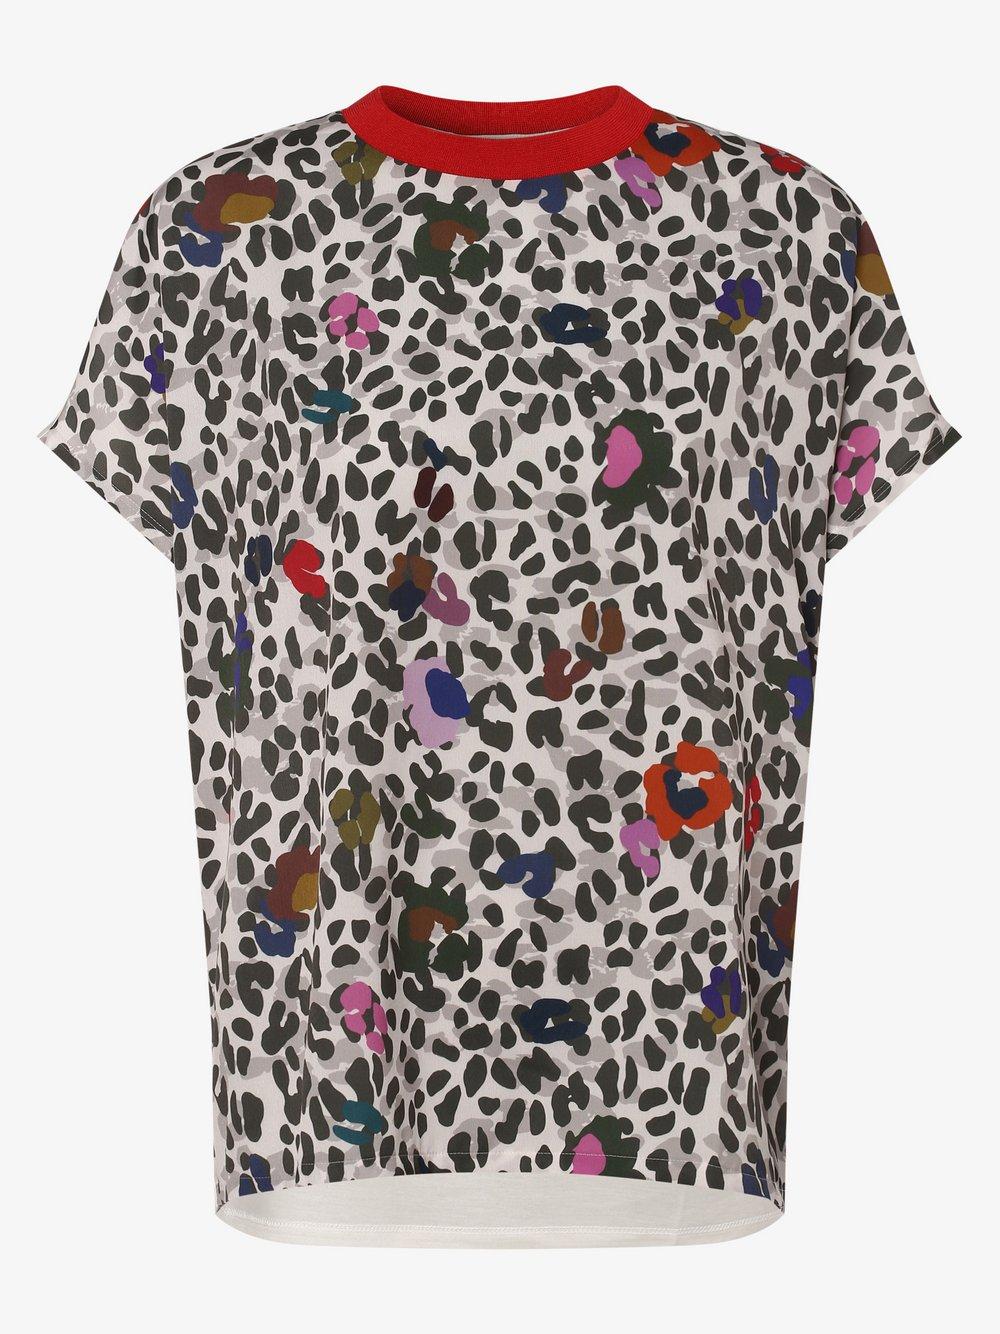 Ted Baker – T-shirt damski – Byella, beżowy Van Graaf 475271-0001-00400